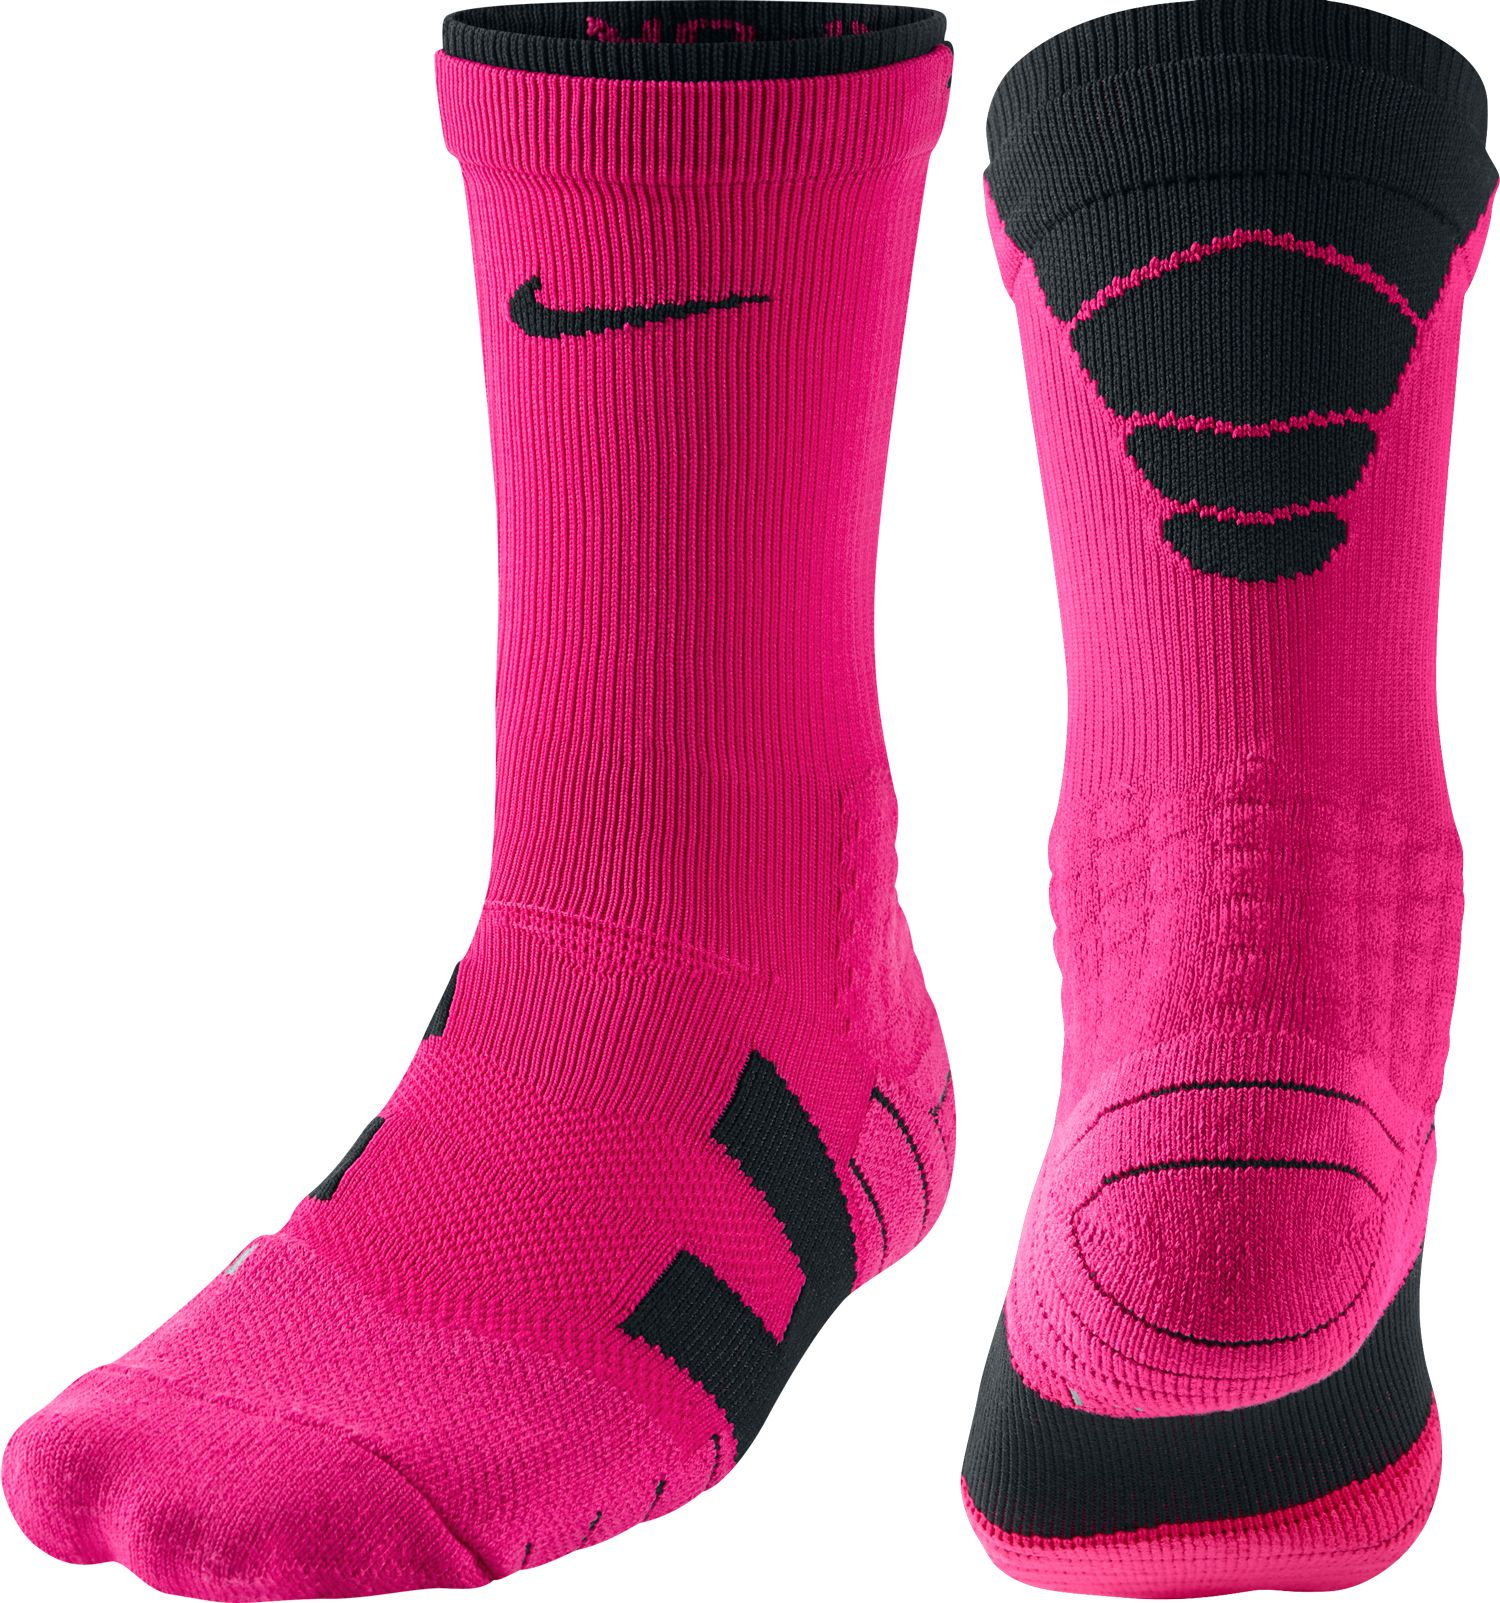 noImageFound ??? - Nike Vapor Crew Football Sock DICK'S Sporting Goods